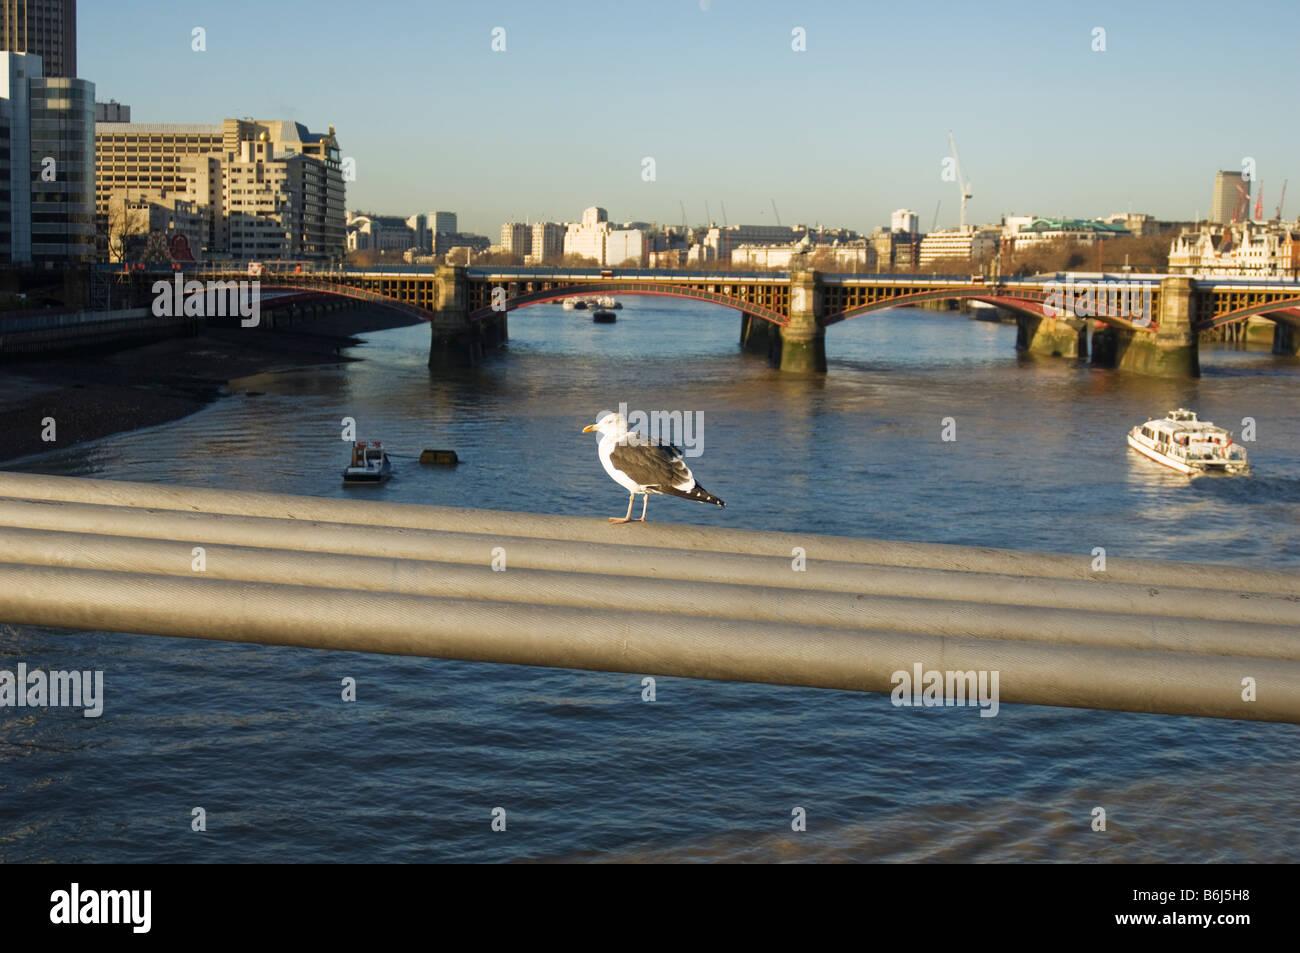 common gull standing on millennium bridge cables london - Stock Image